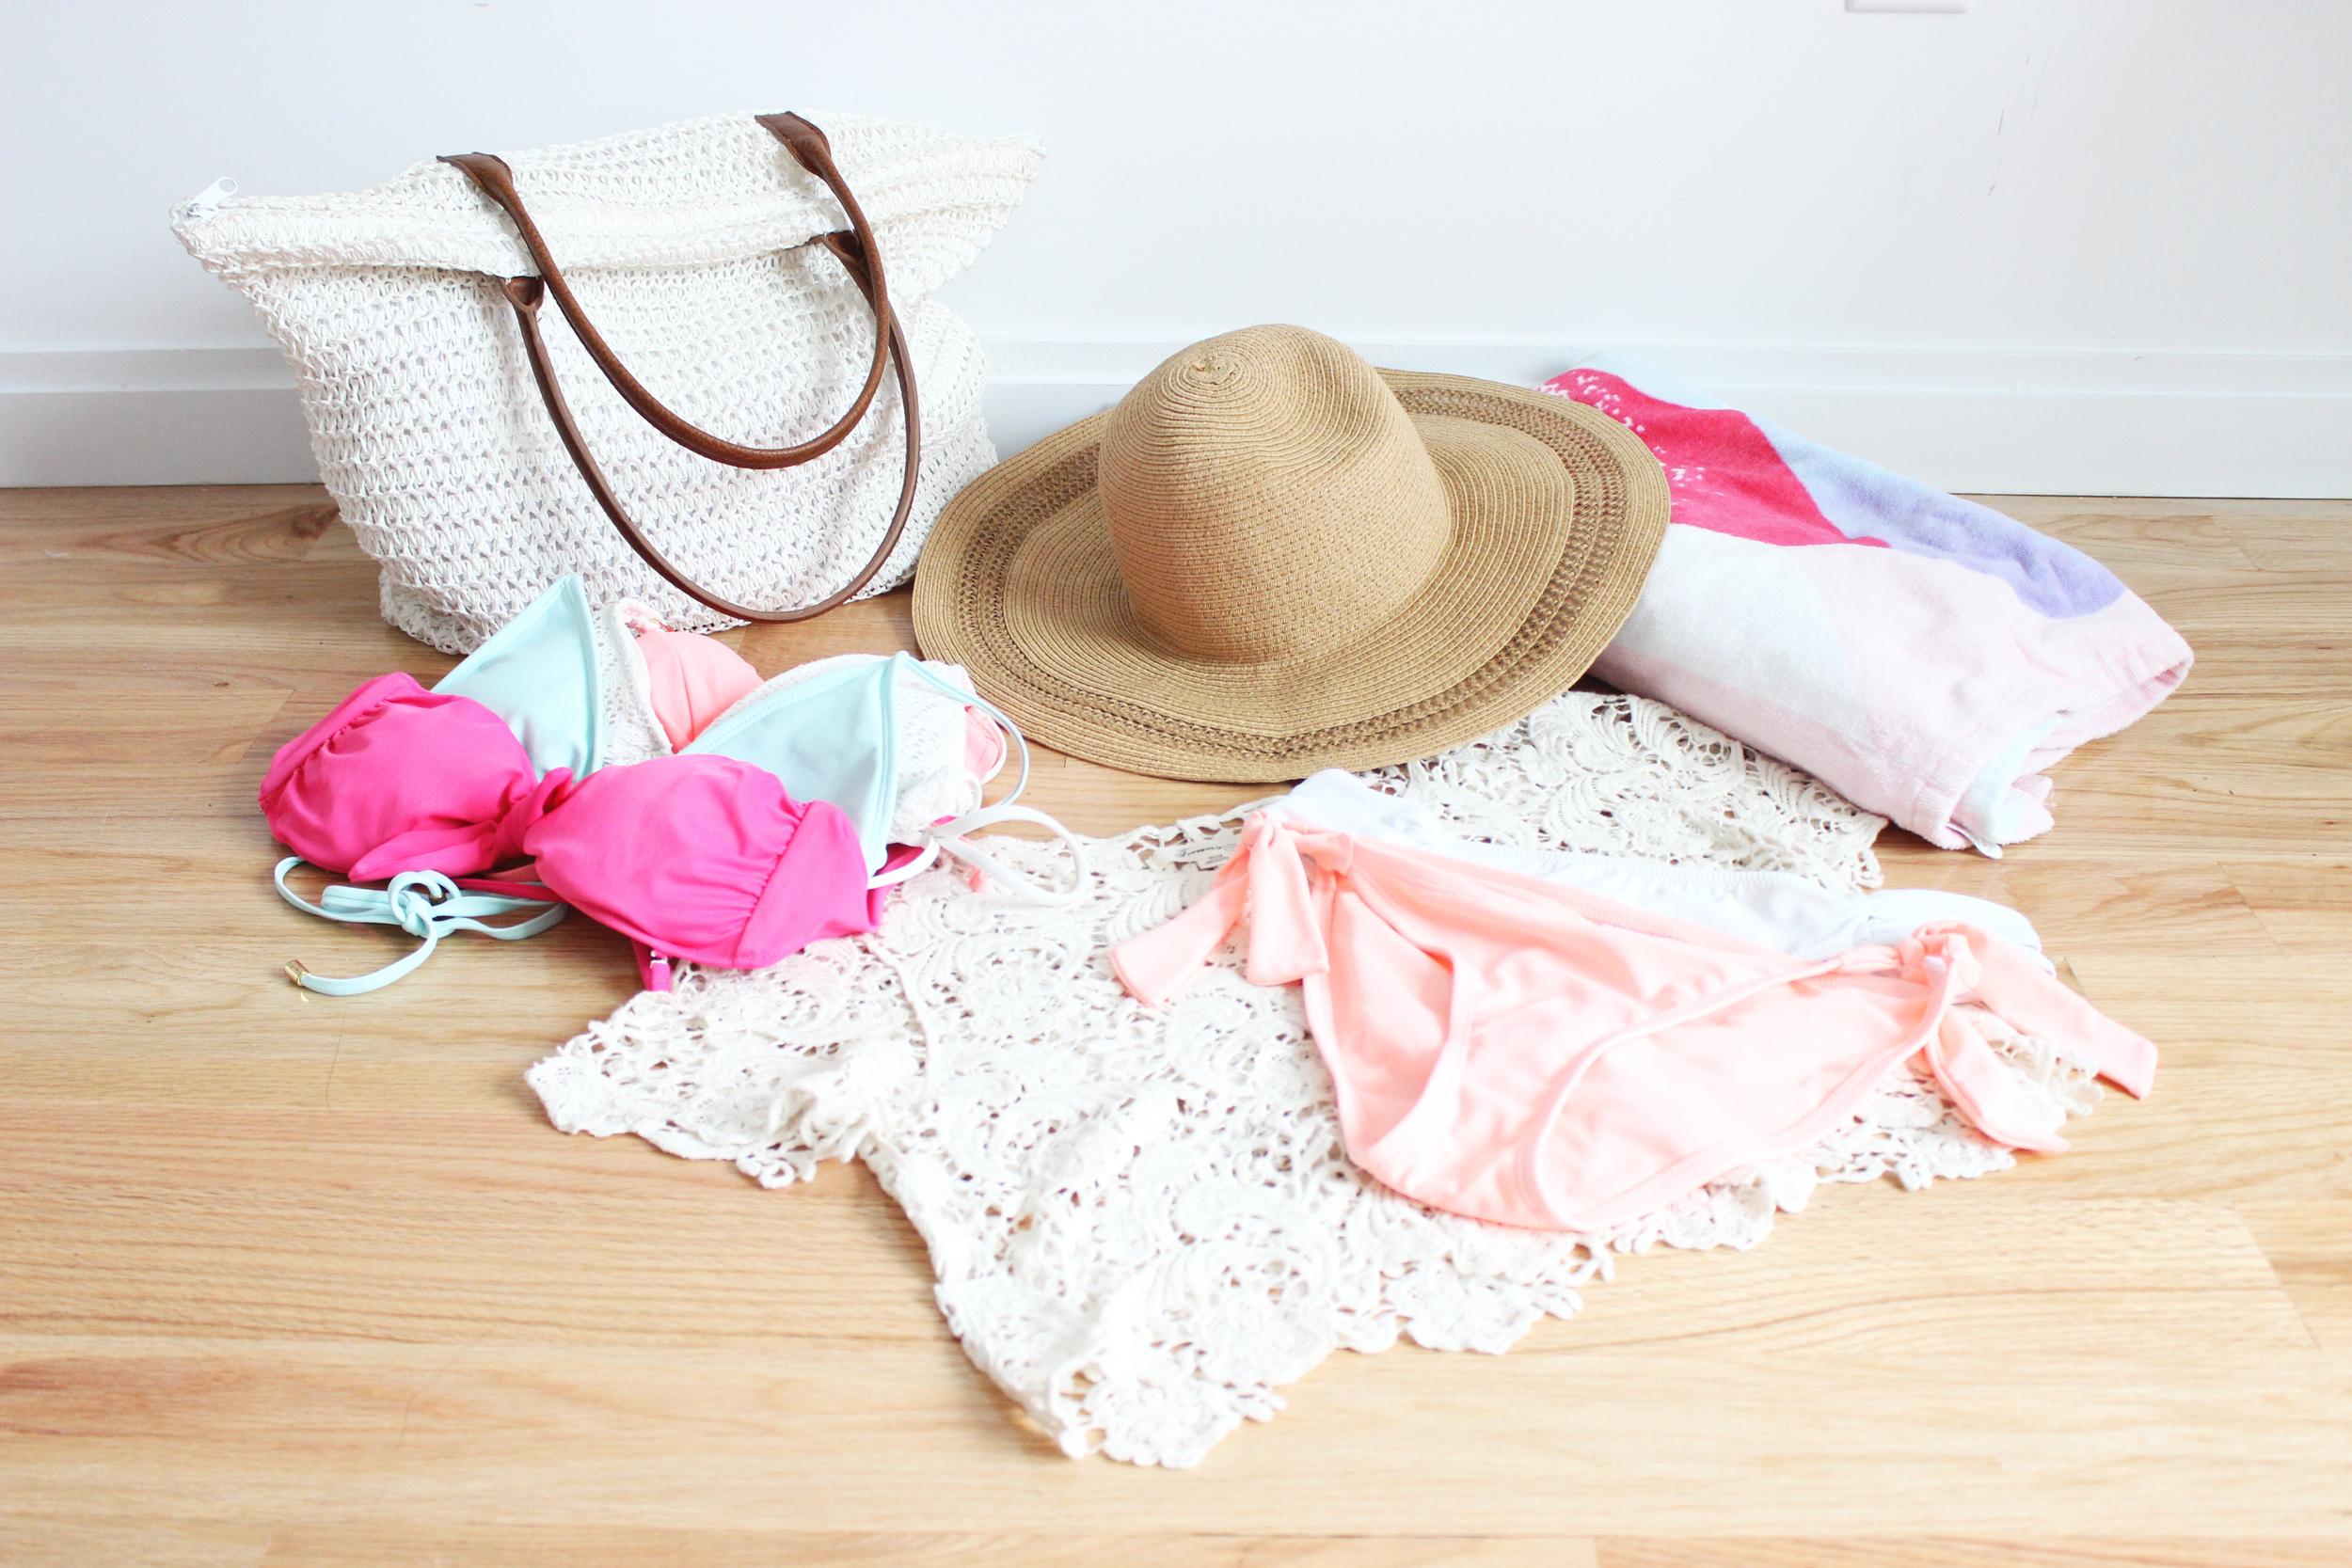 Beach essentials left to right: beach bag, bikinis, sun hat, crop top cover up, bikini bottoms, and beach towel